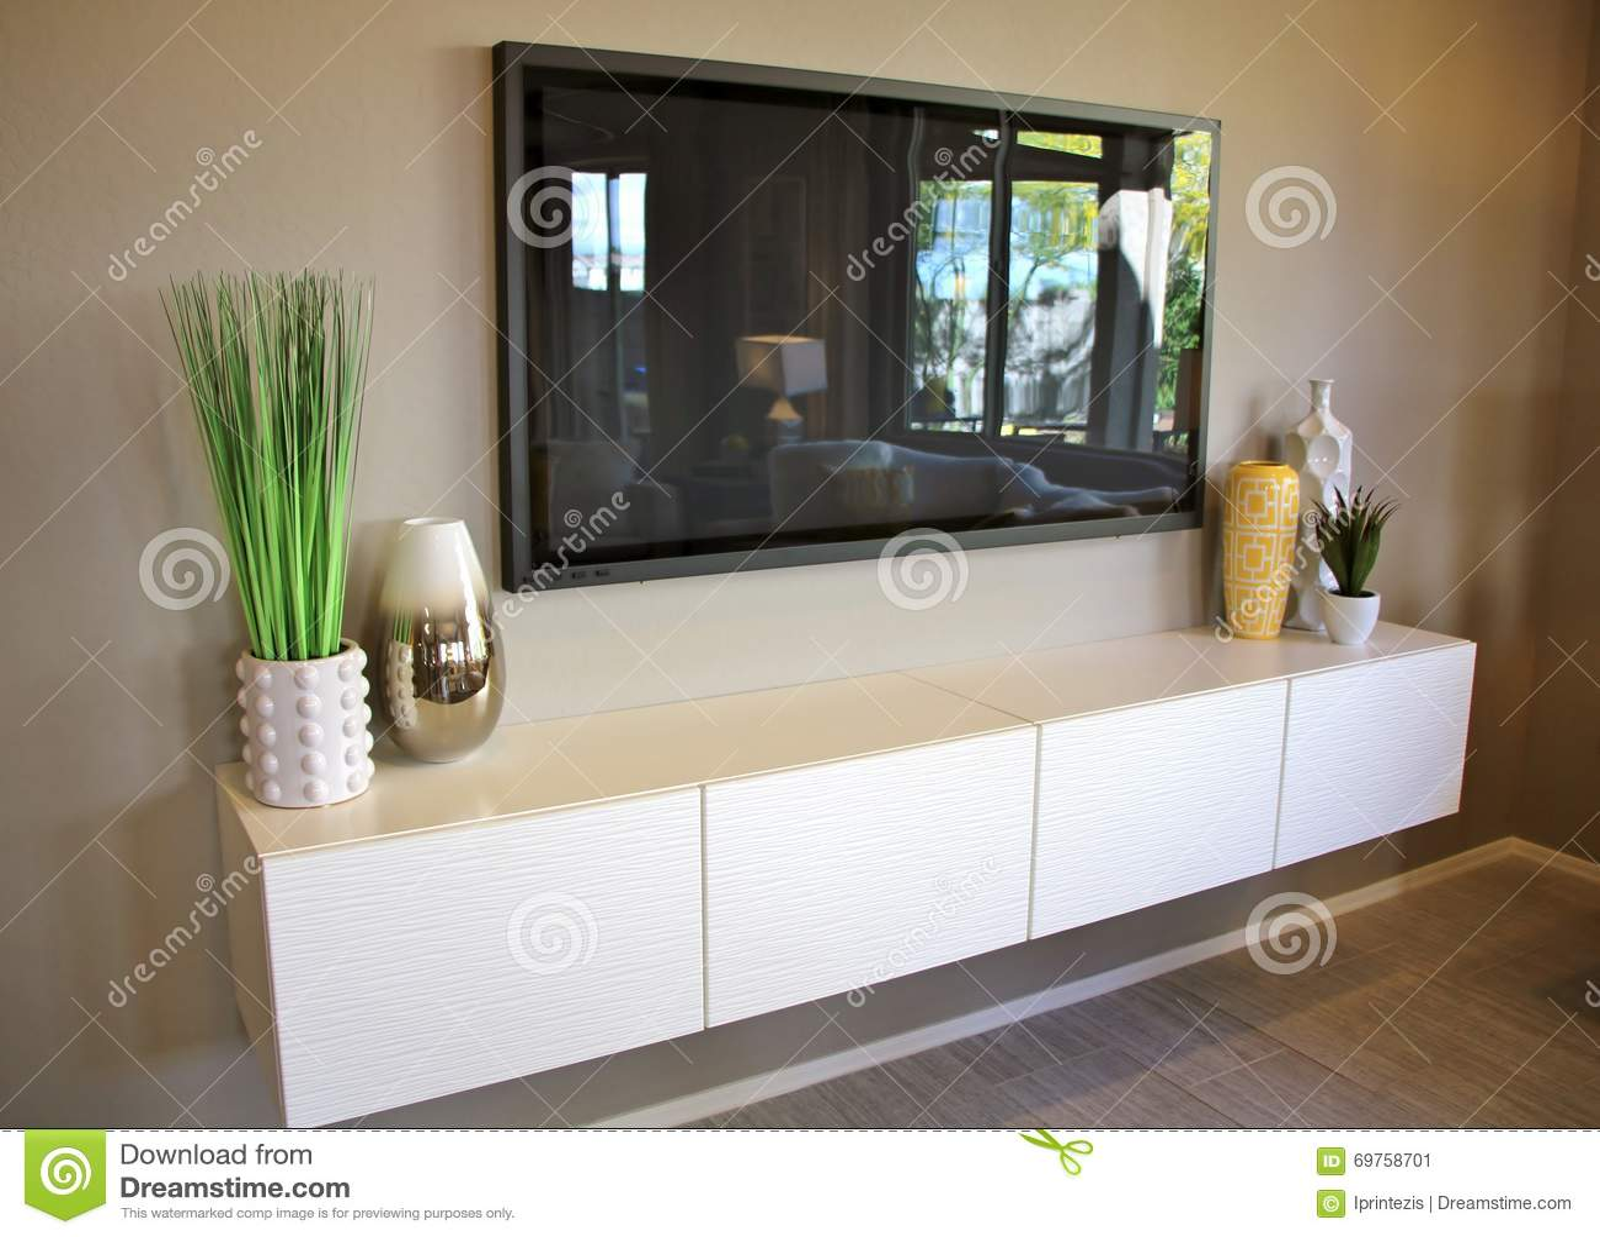 Large LCD TV Setting